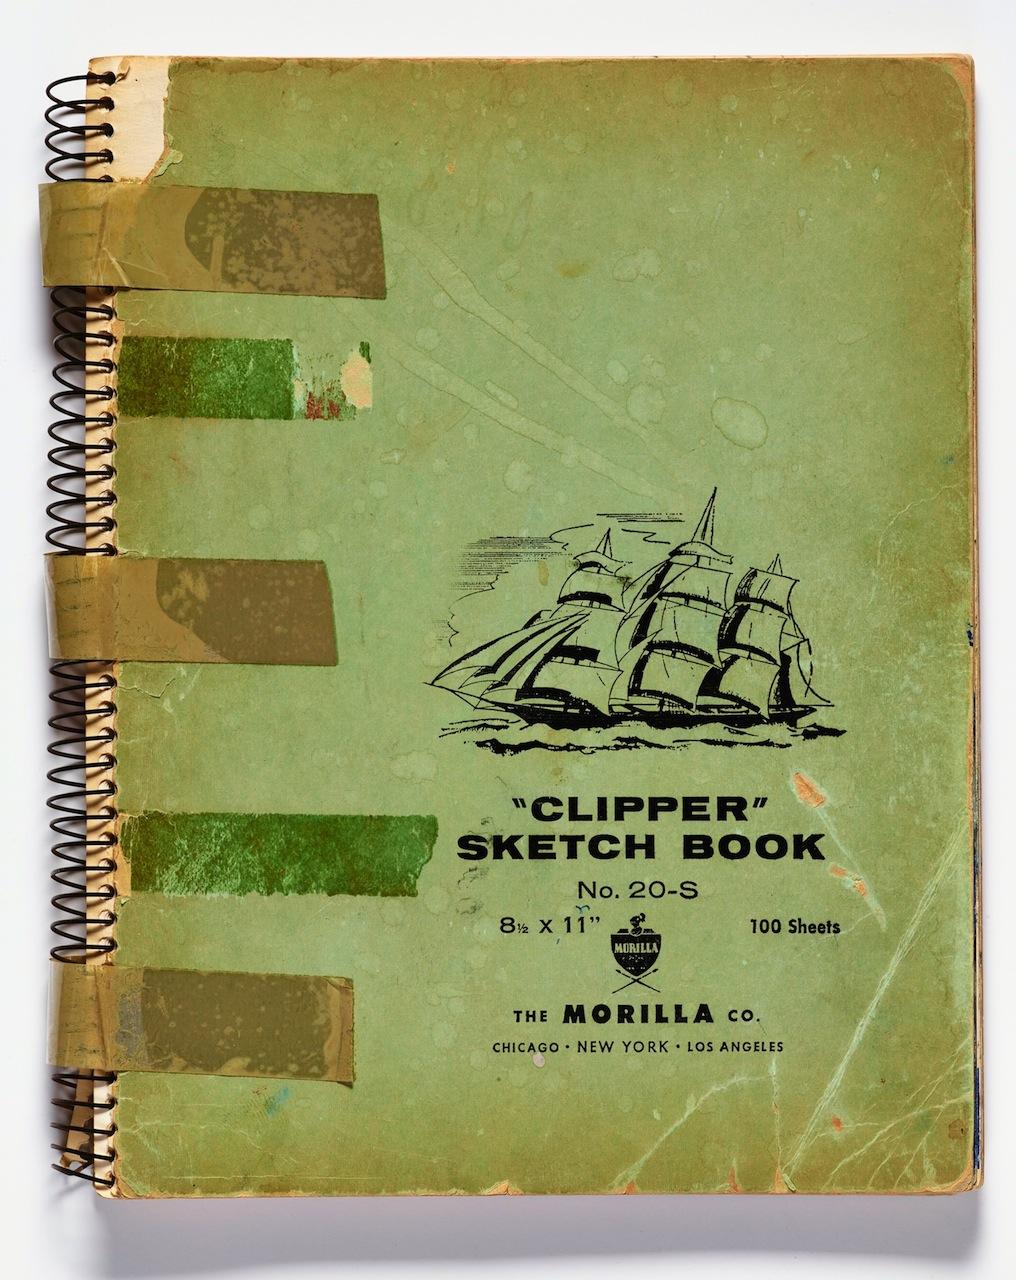 Richard Diebenkorn, Cover of Sketchbook #8 (1943–1993), printing ink on laminated board (gift of Phyllis Diebenkorn, © The Richard Diebenkorn Foundation)